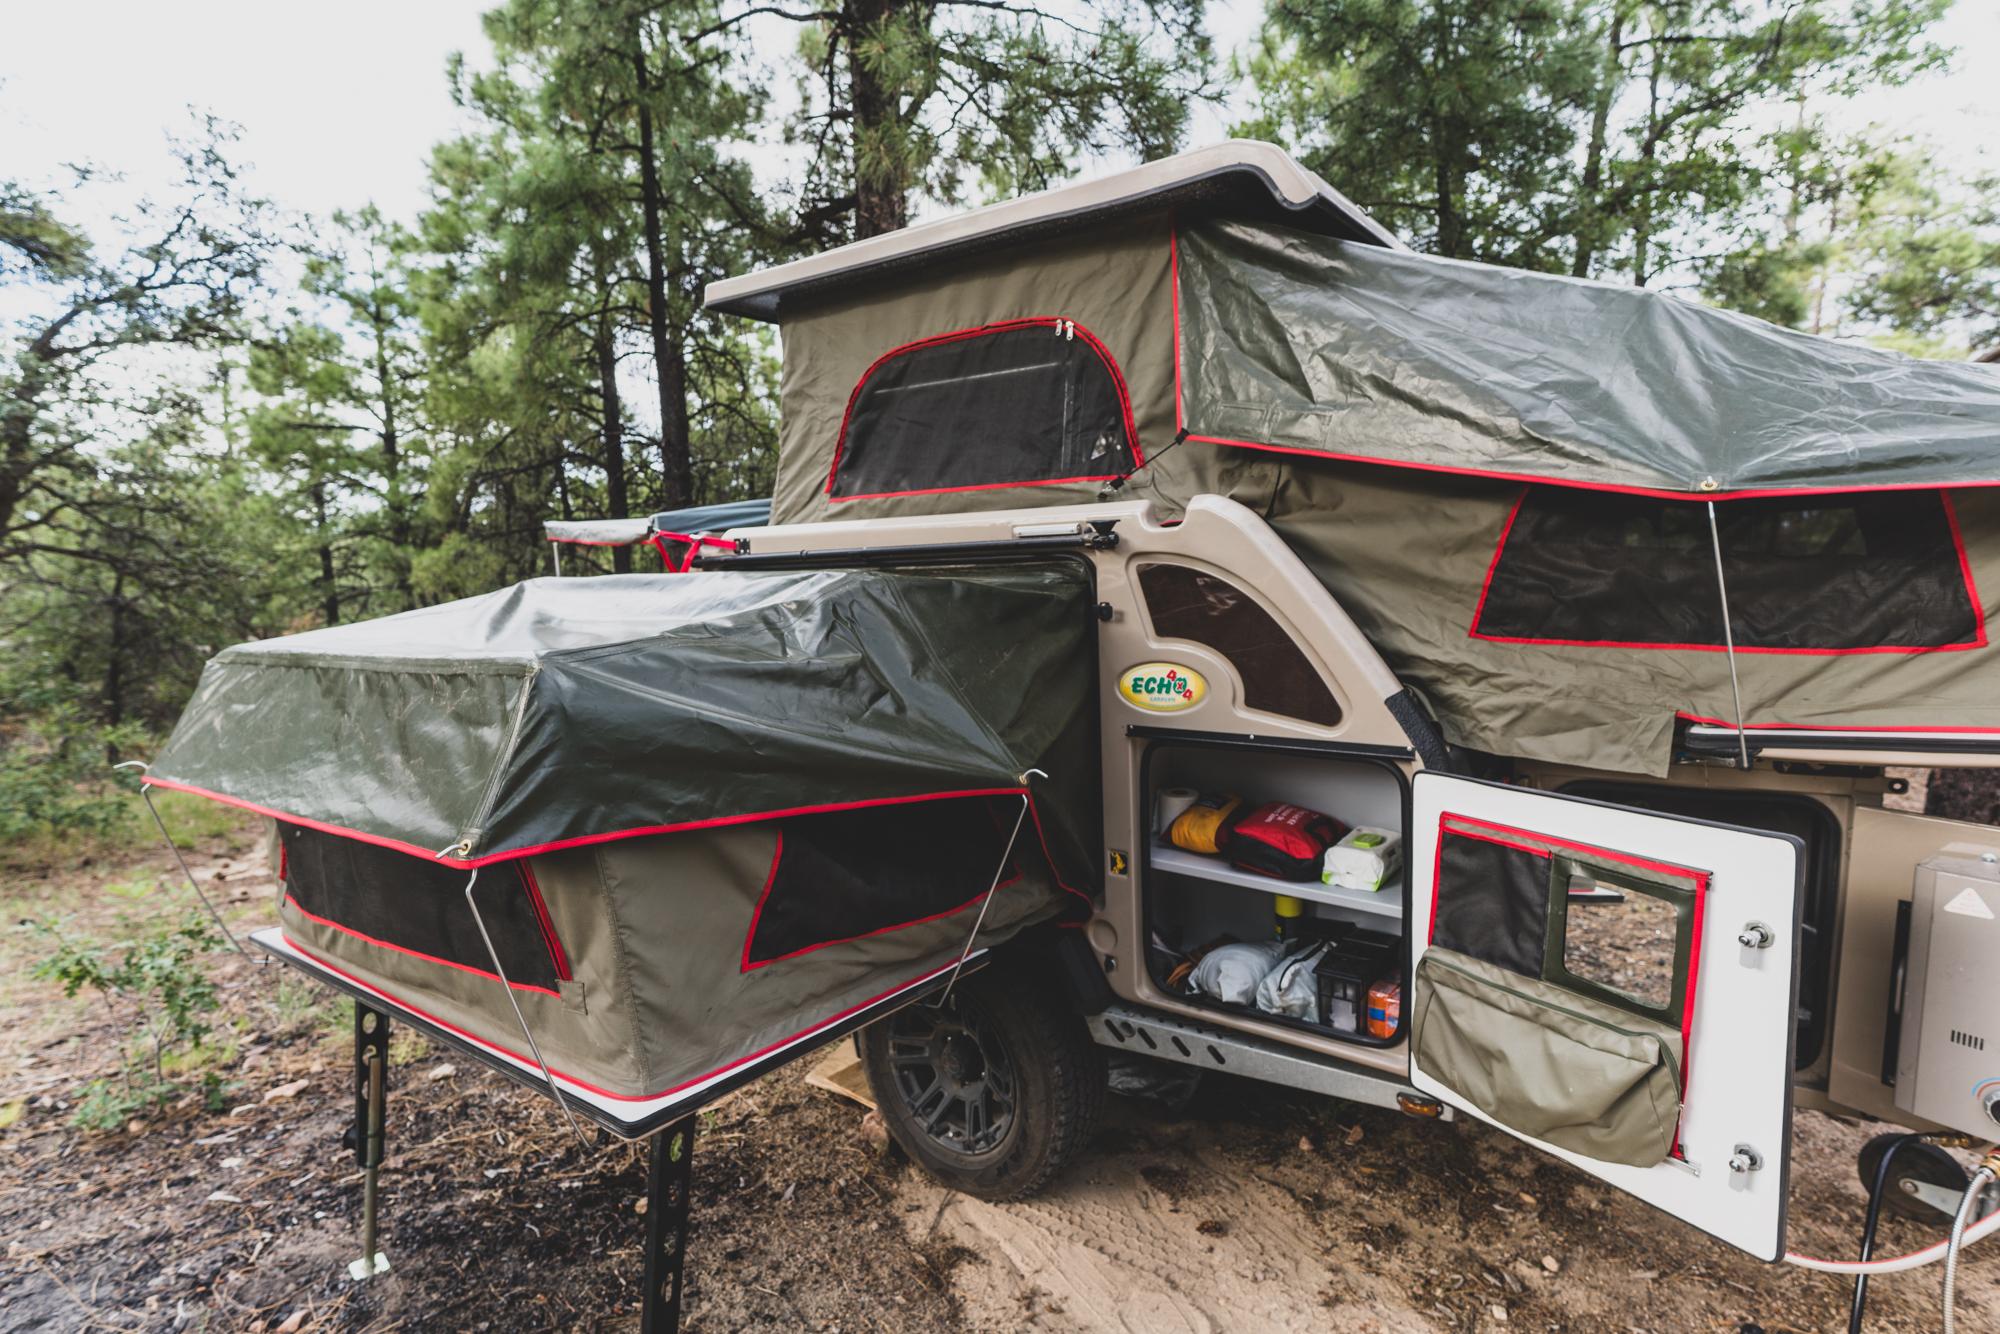 The Chobe Tec Overland Trailer Sleeps Four - Expedition Portal